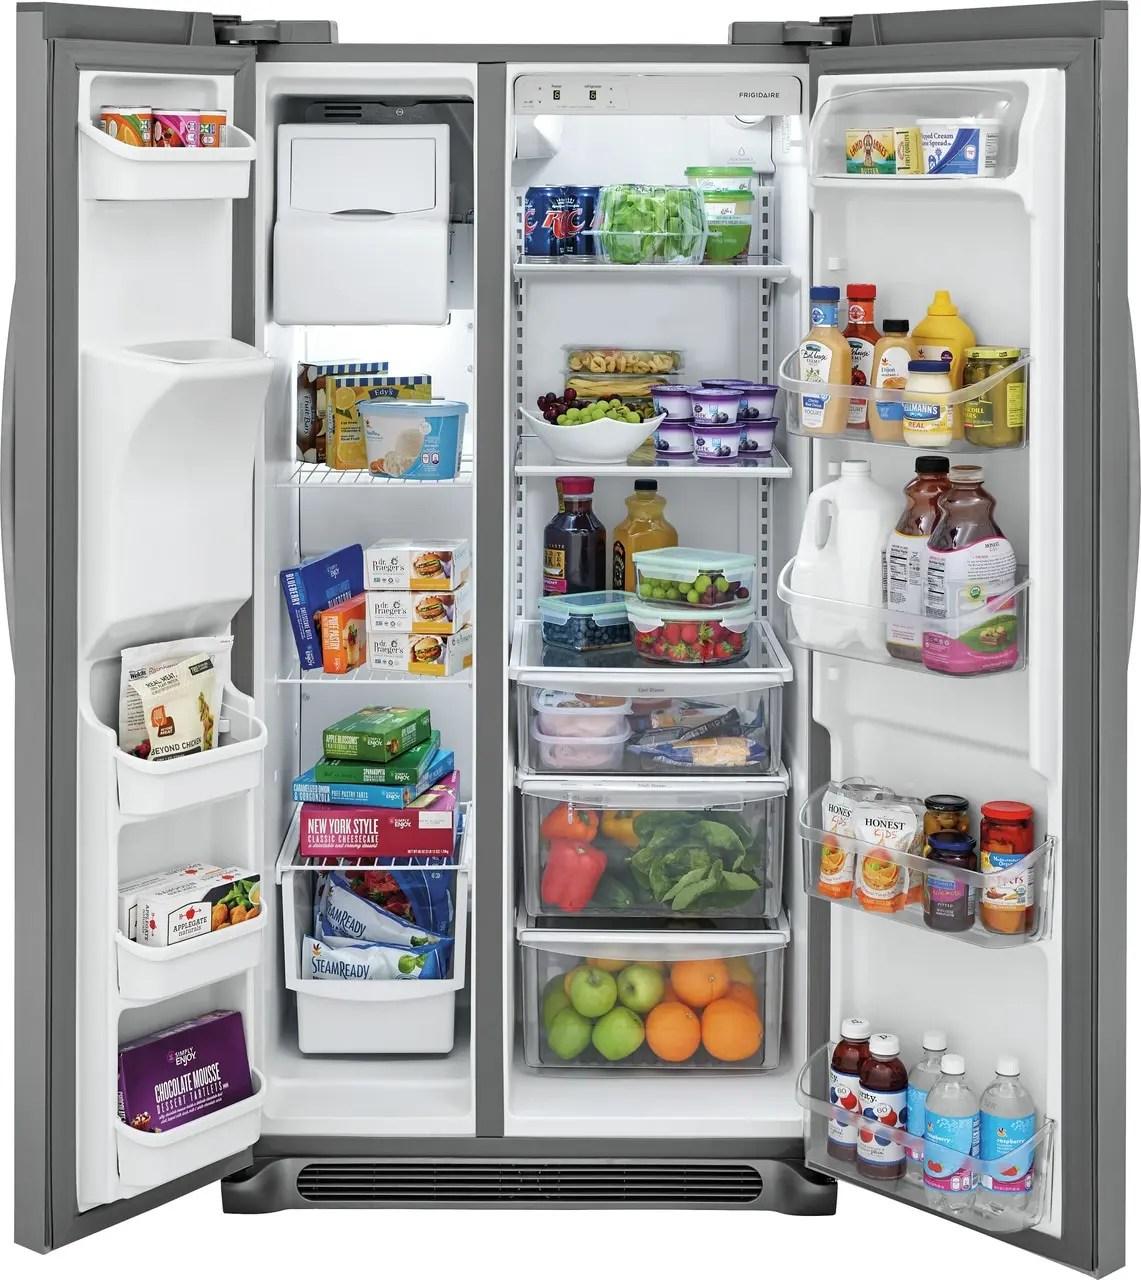 22.1 Cu. Ft. Side-by-Side Refrigerator Photo #4